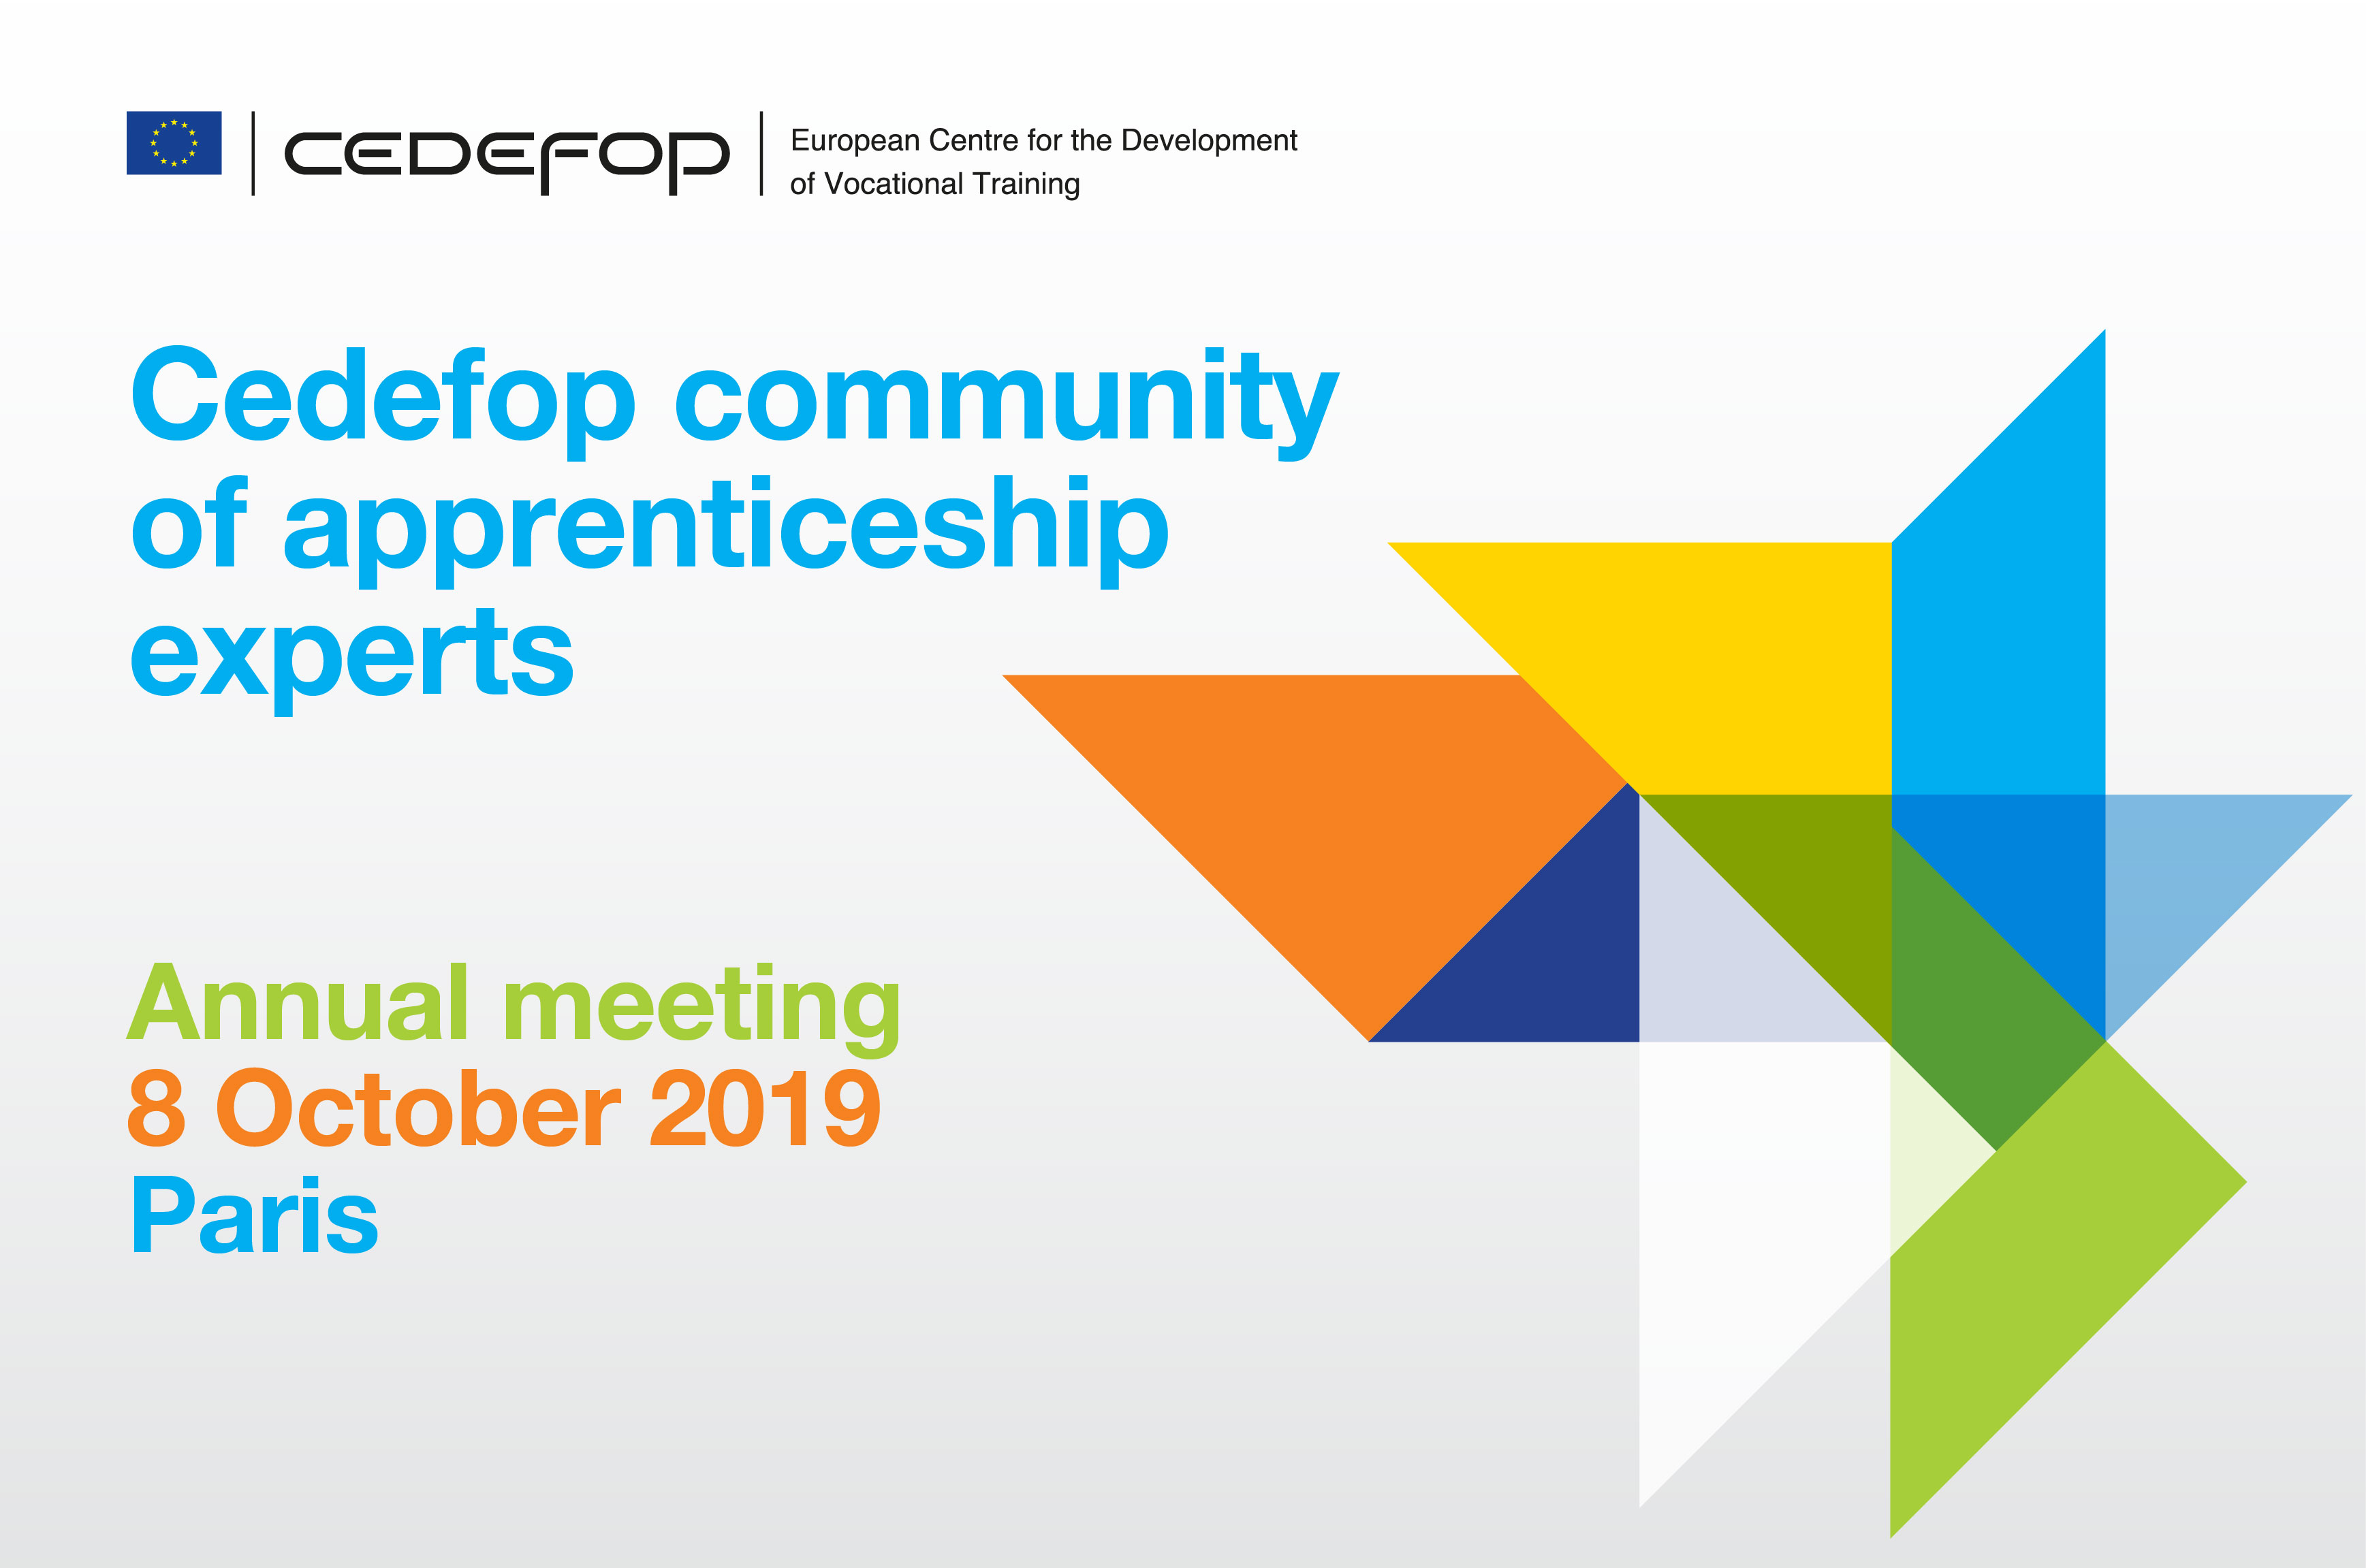 https://www.cedefop.europa.eu/files/images/2019_meeting_cedefop_community_of_apprenticeship_experts.jpg